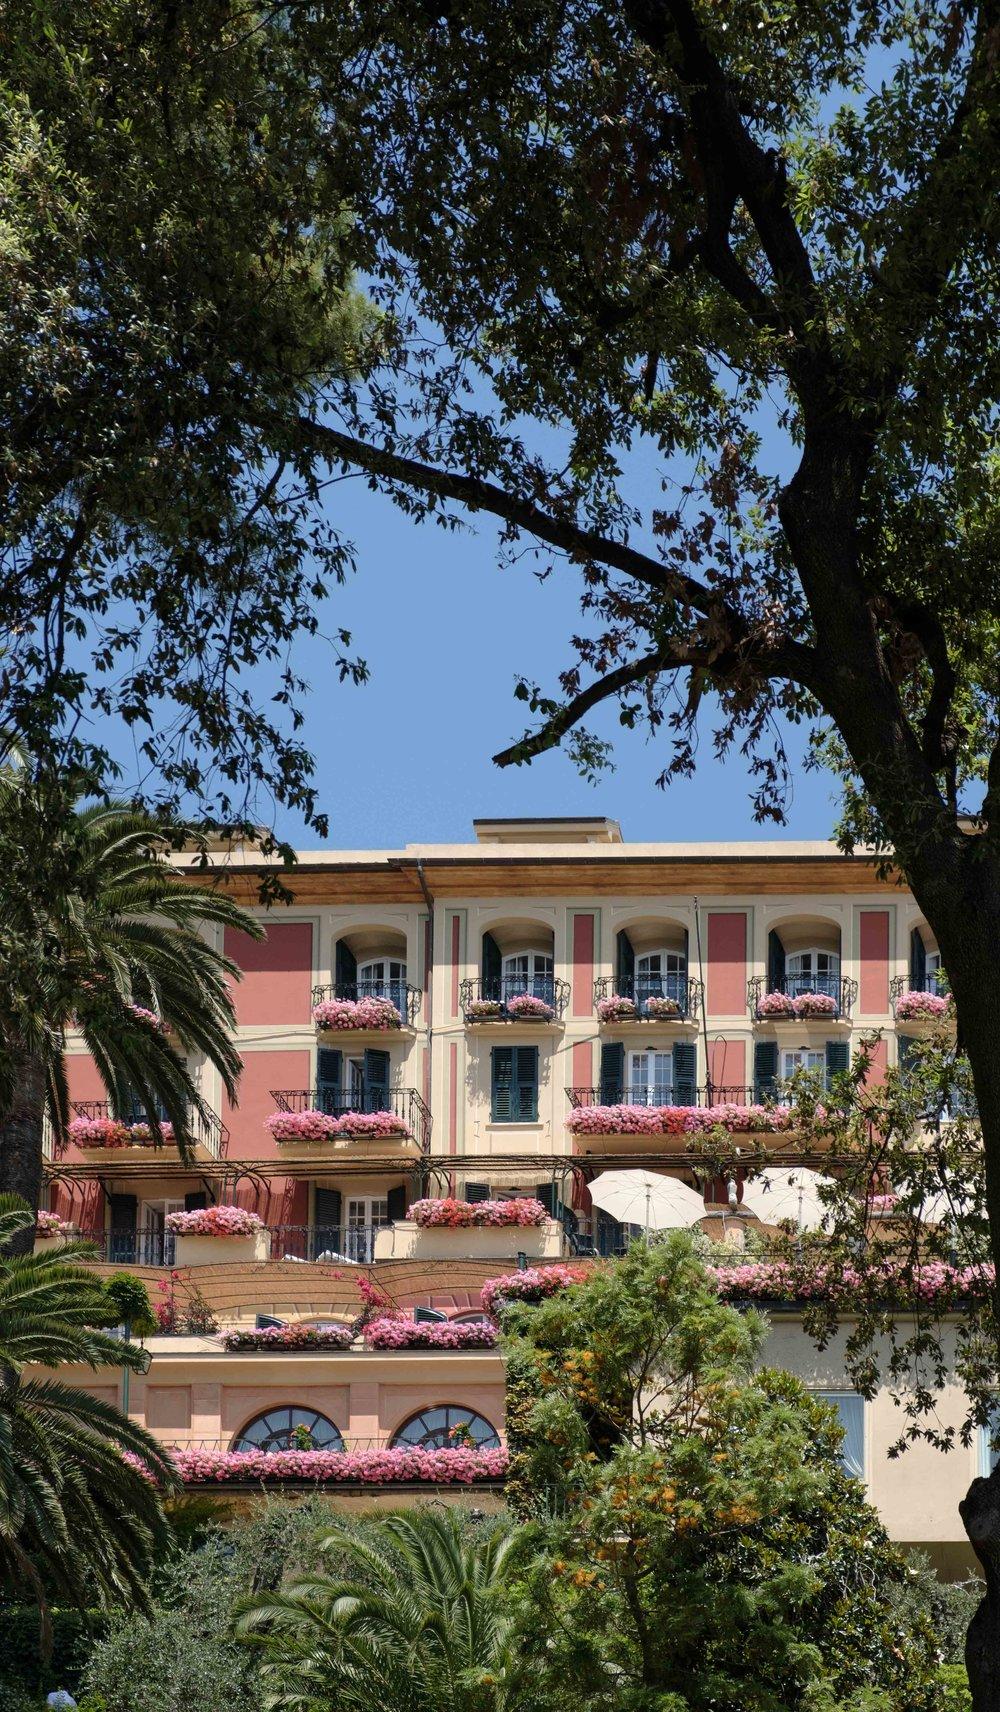 BELMOND HOTEL PORTOFINO - VIA TOLILA